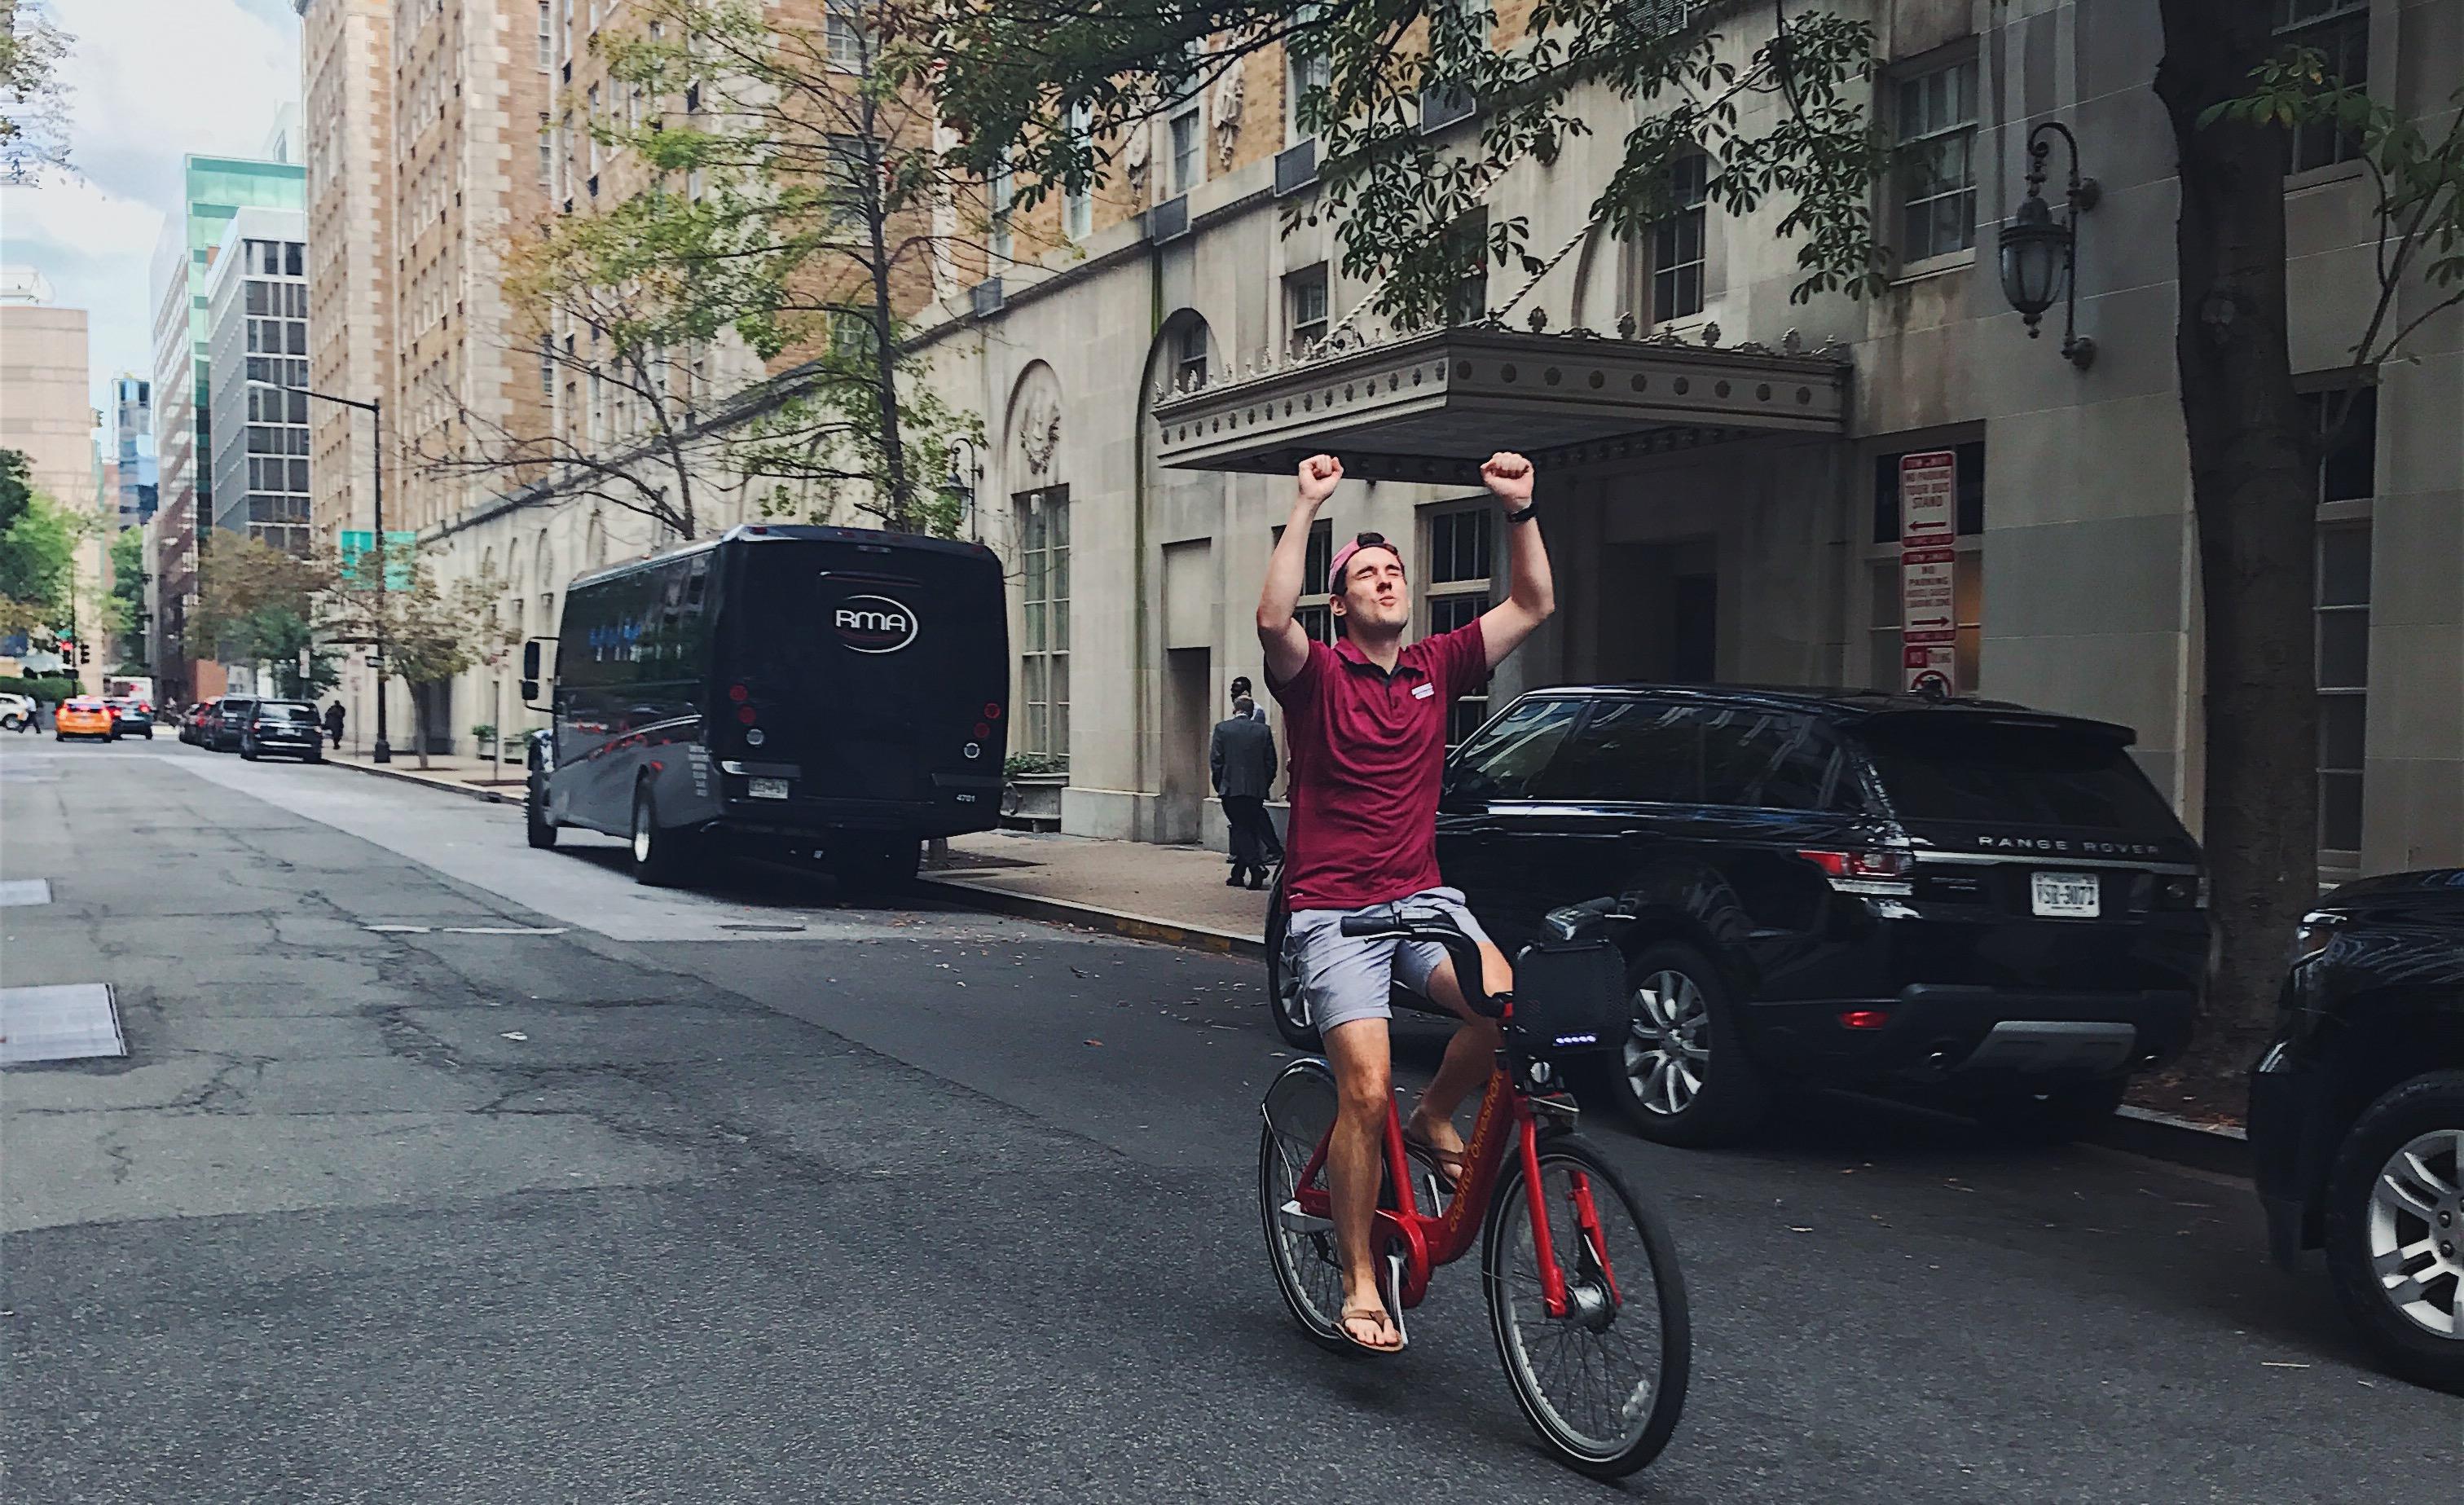 colin-on-bikeshare-bike-mobility-city